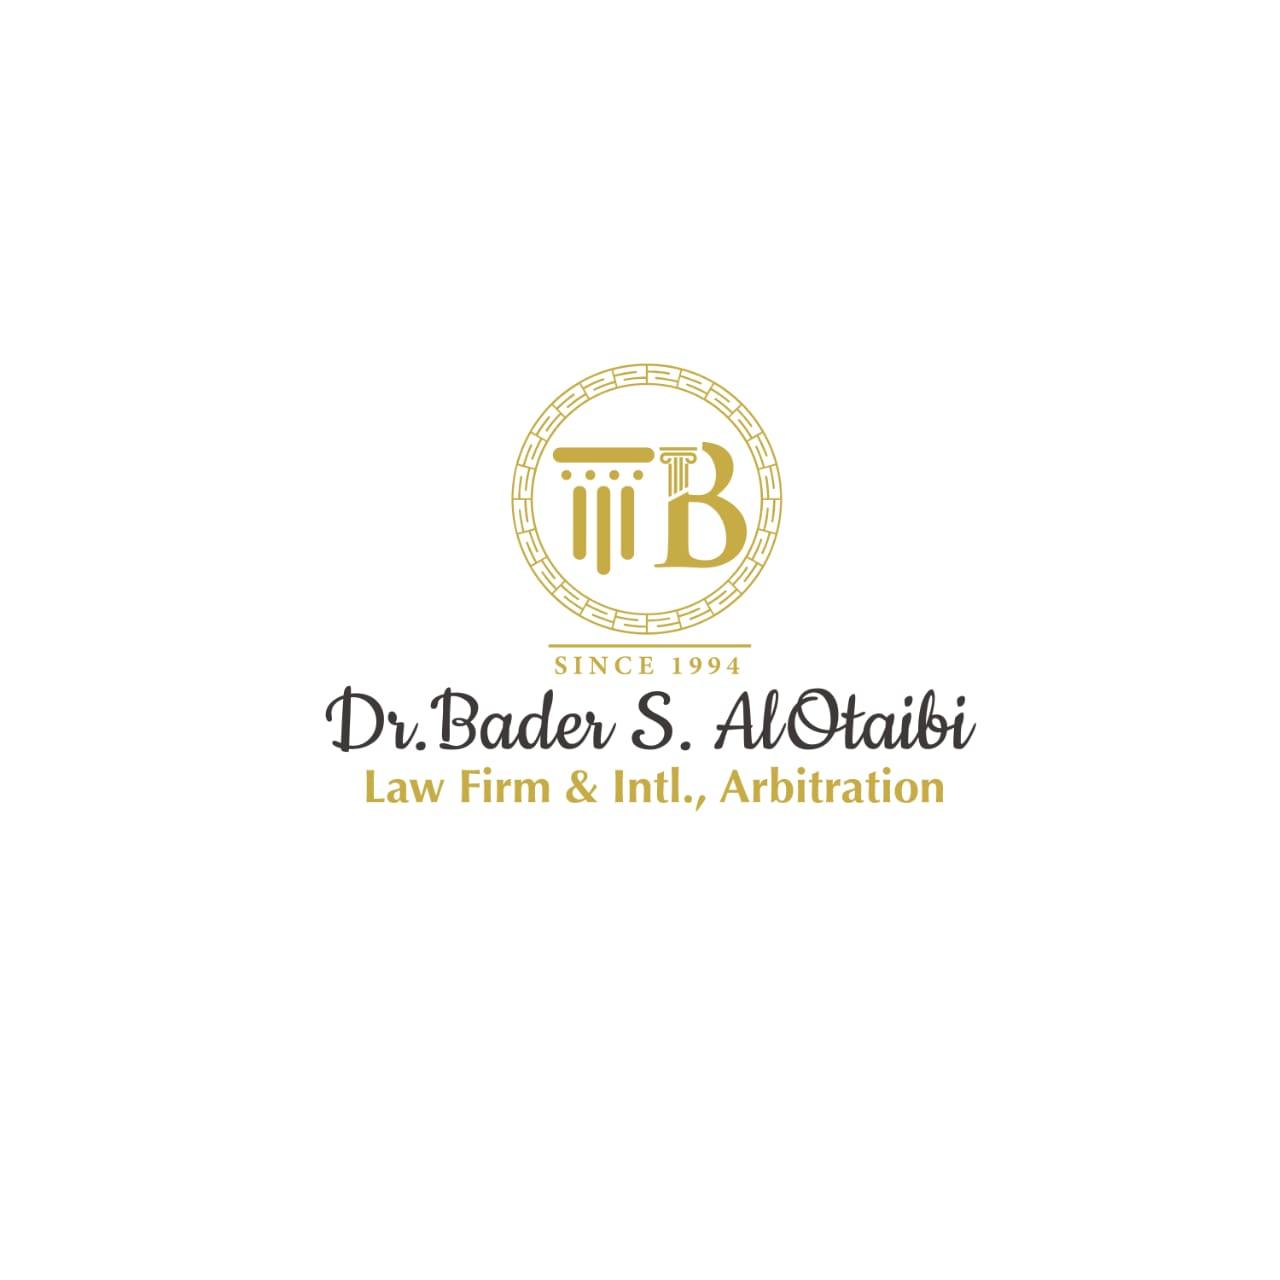 Dr.Bader S. Al Otaibi Law Firm & Intl. Arbitration logo